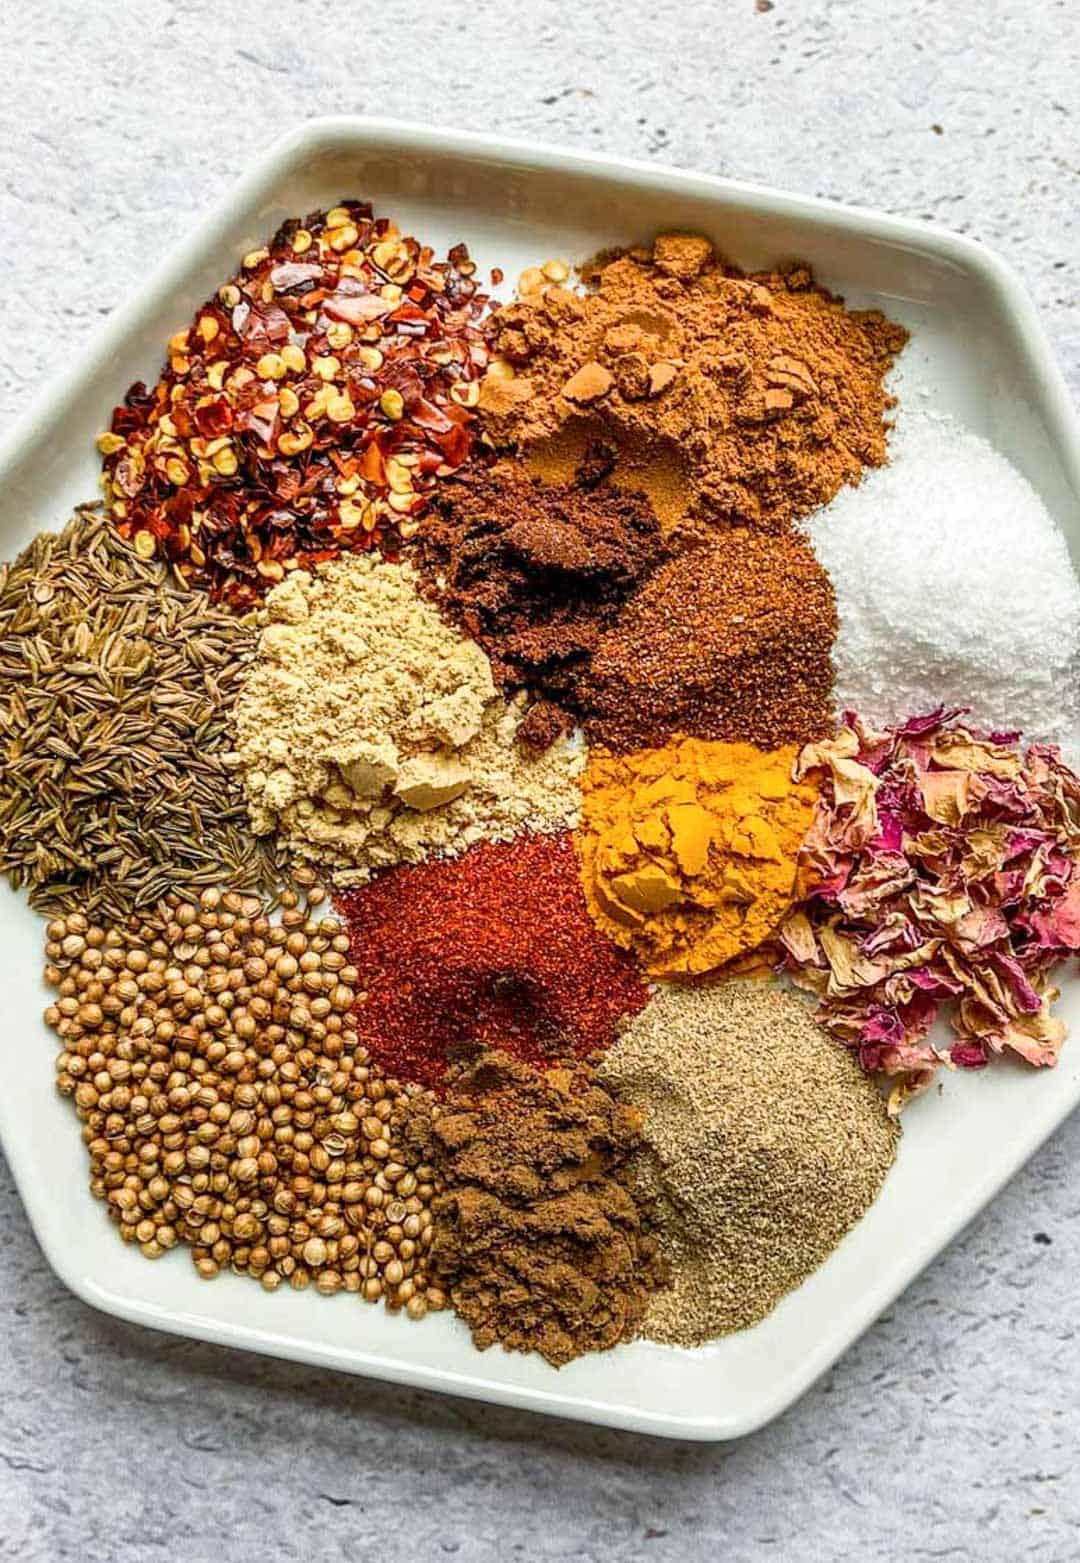 ras el hanout ingredients on a plate